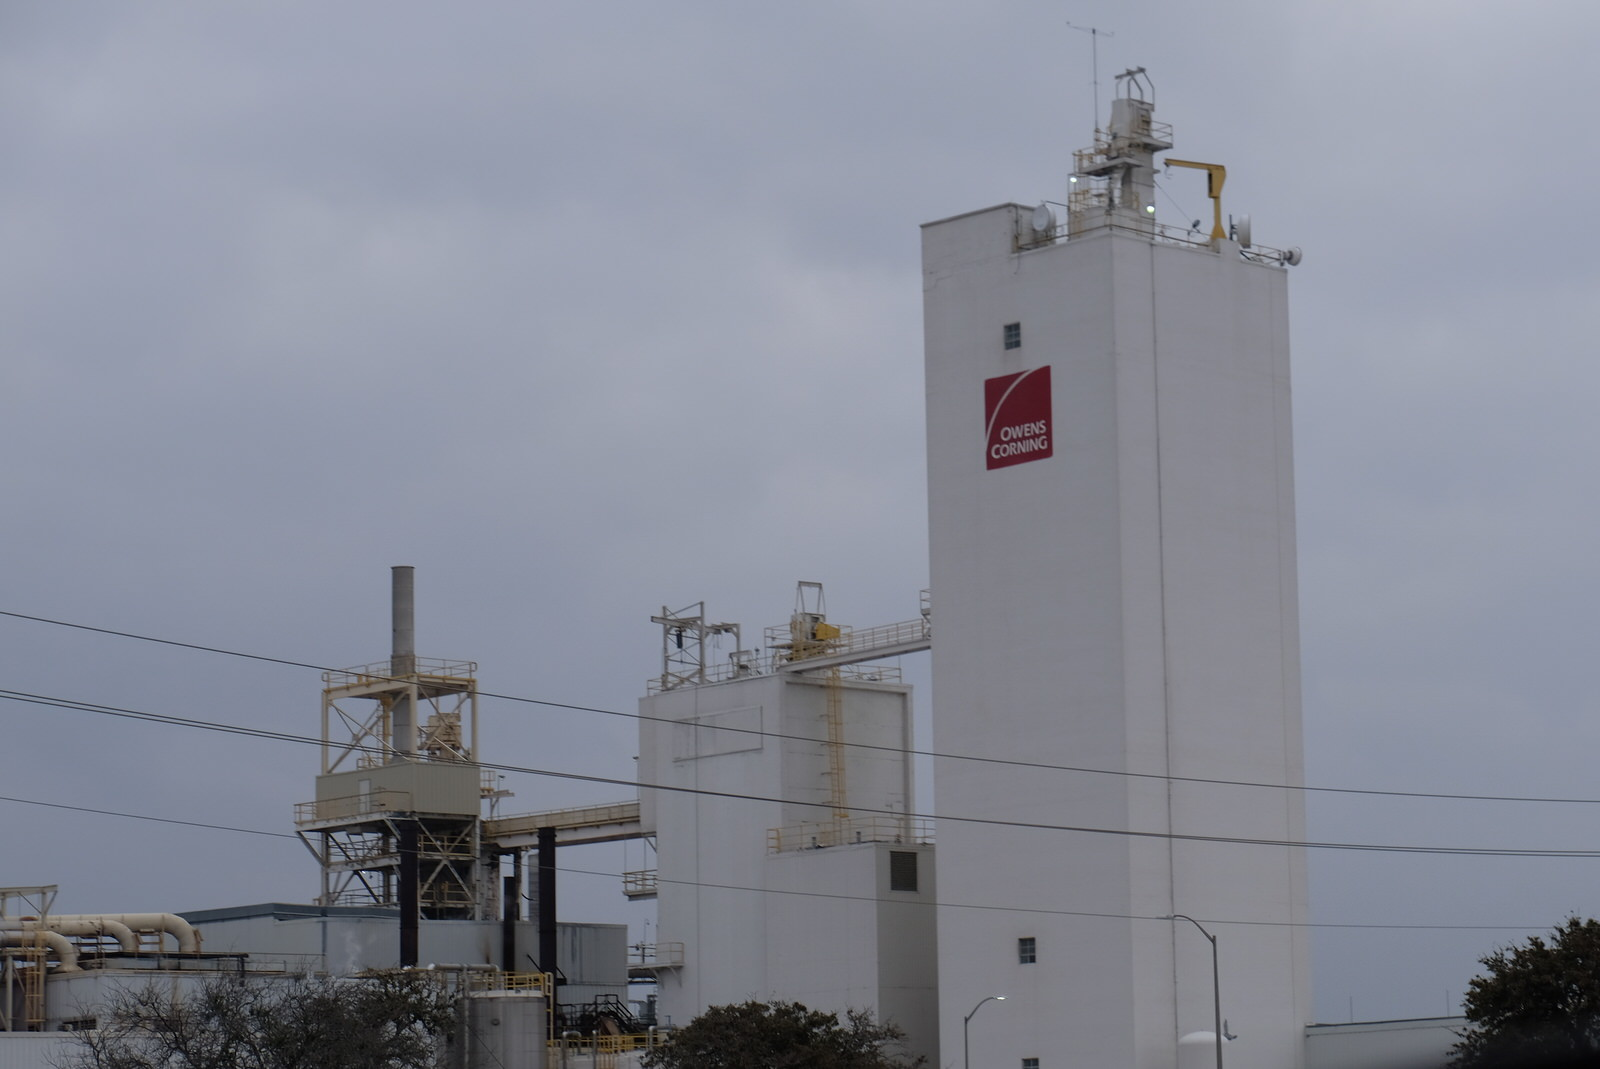 Owens Corning plant in Waxahachie, Texas.